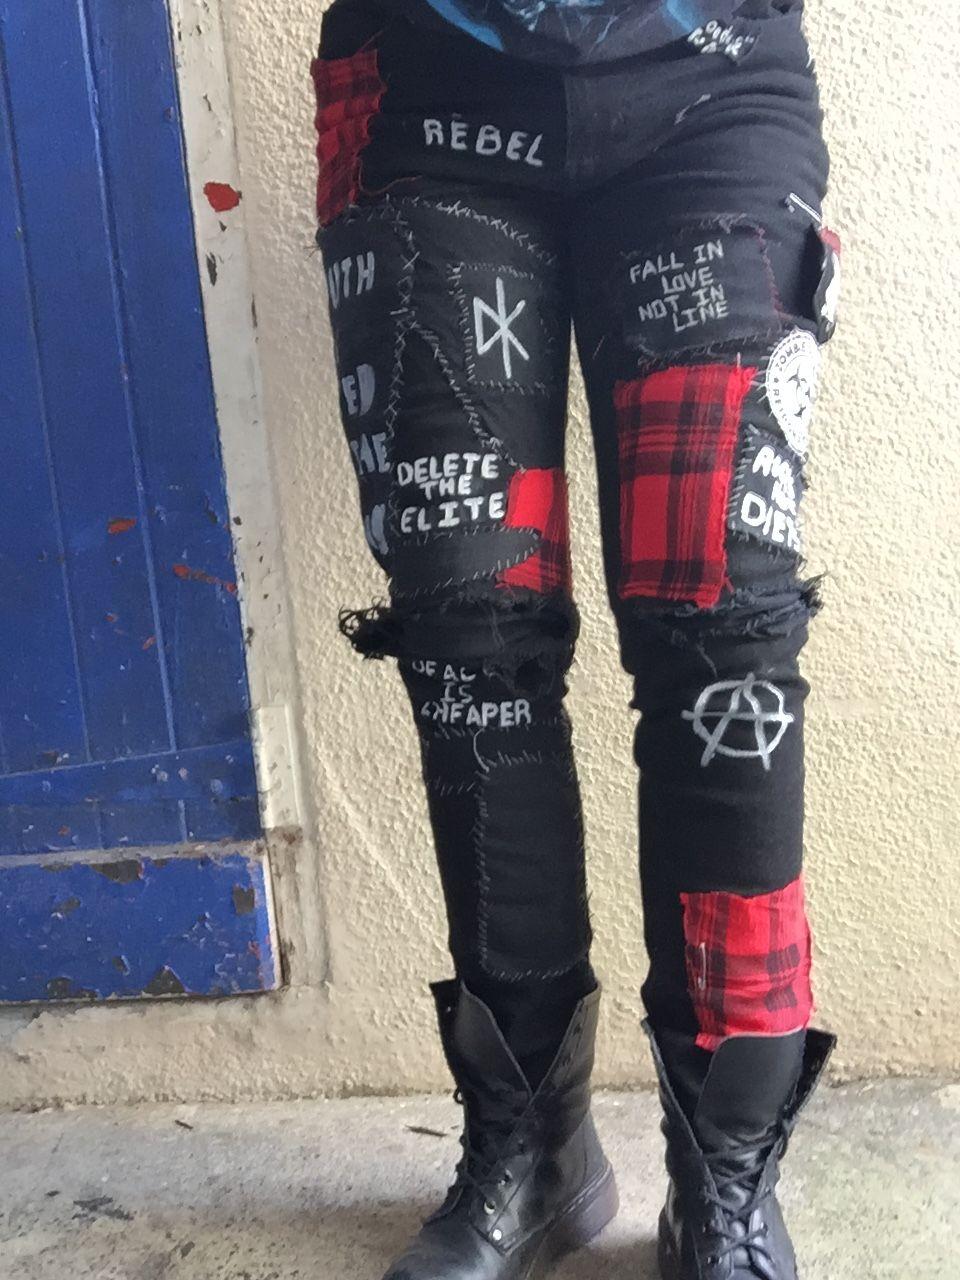 *My Own Work* punk pants in progress//not completed #punk #inspo #punkinspo #crust #crustpunk